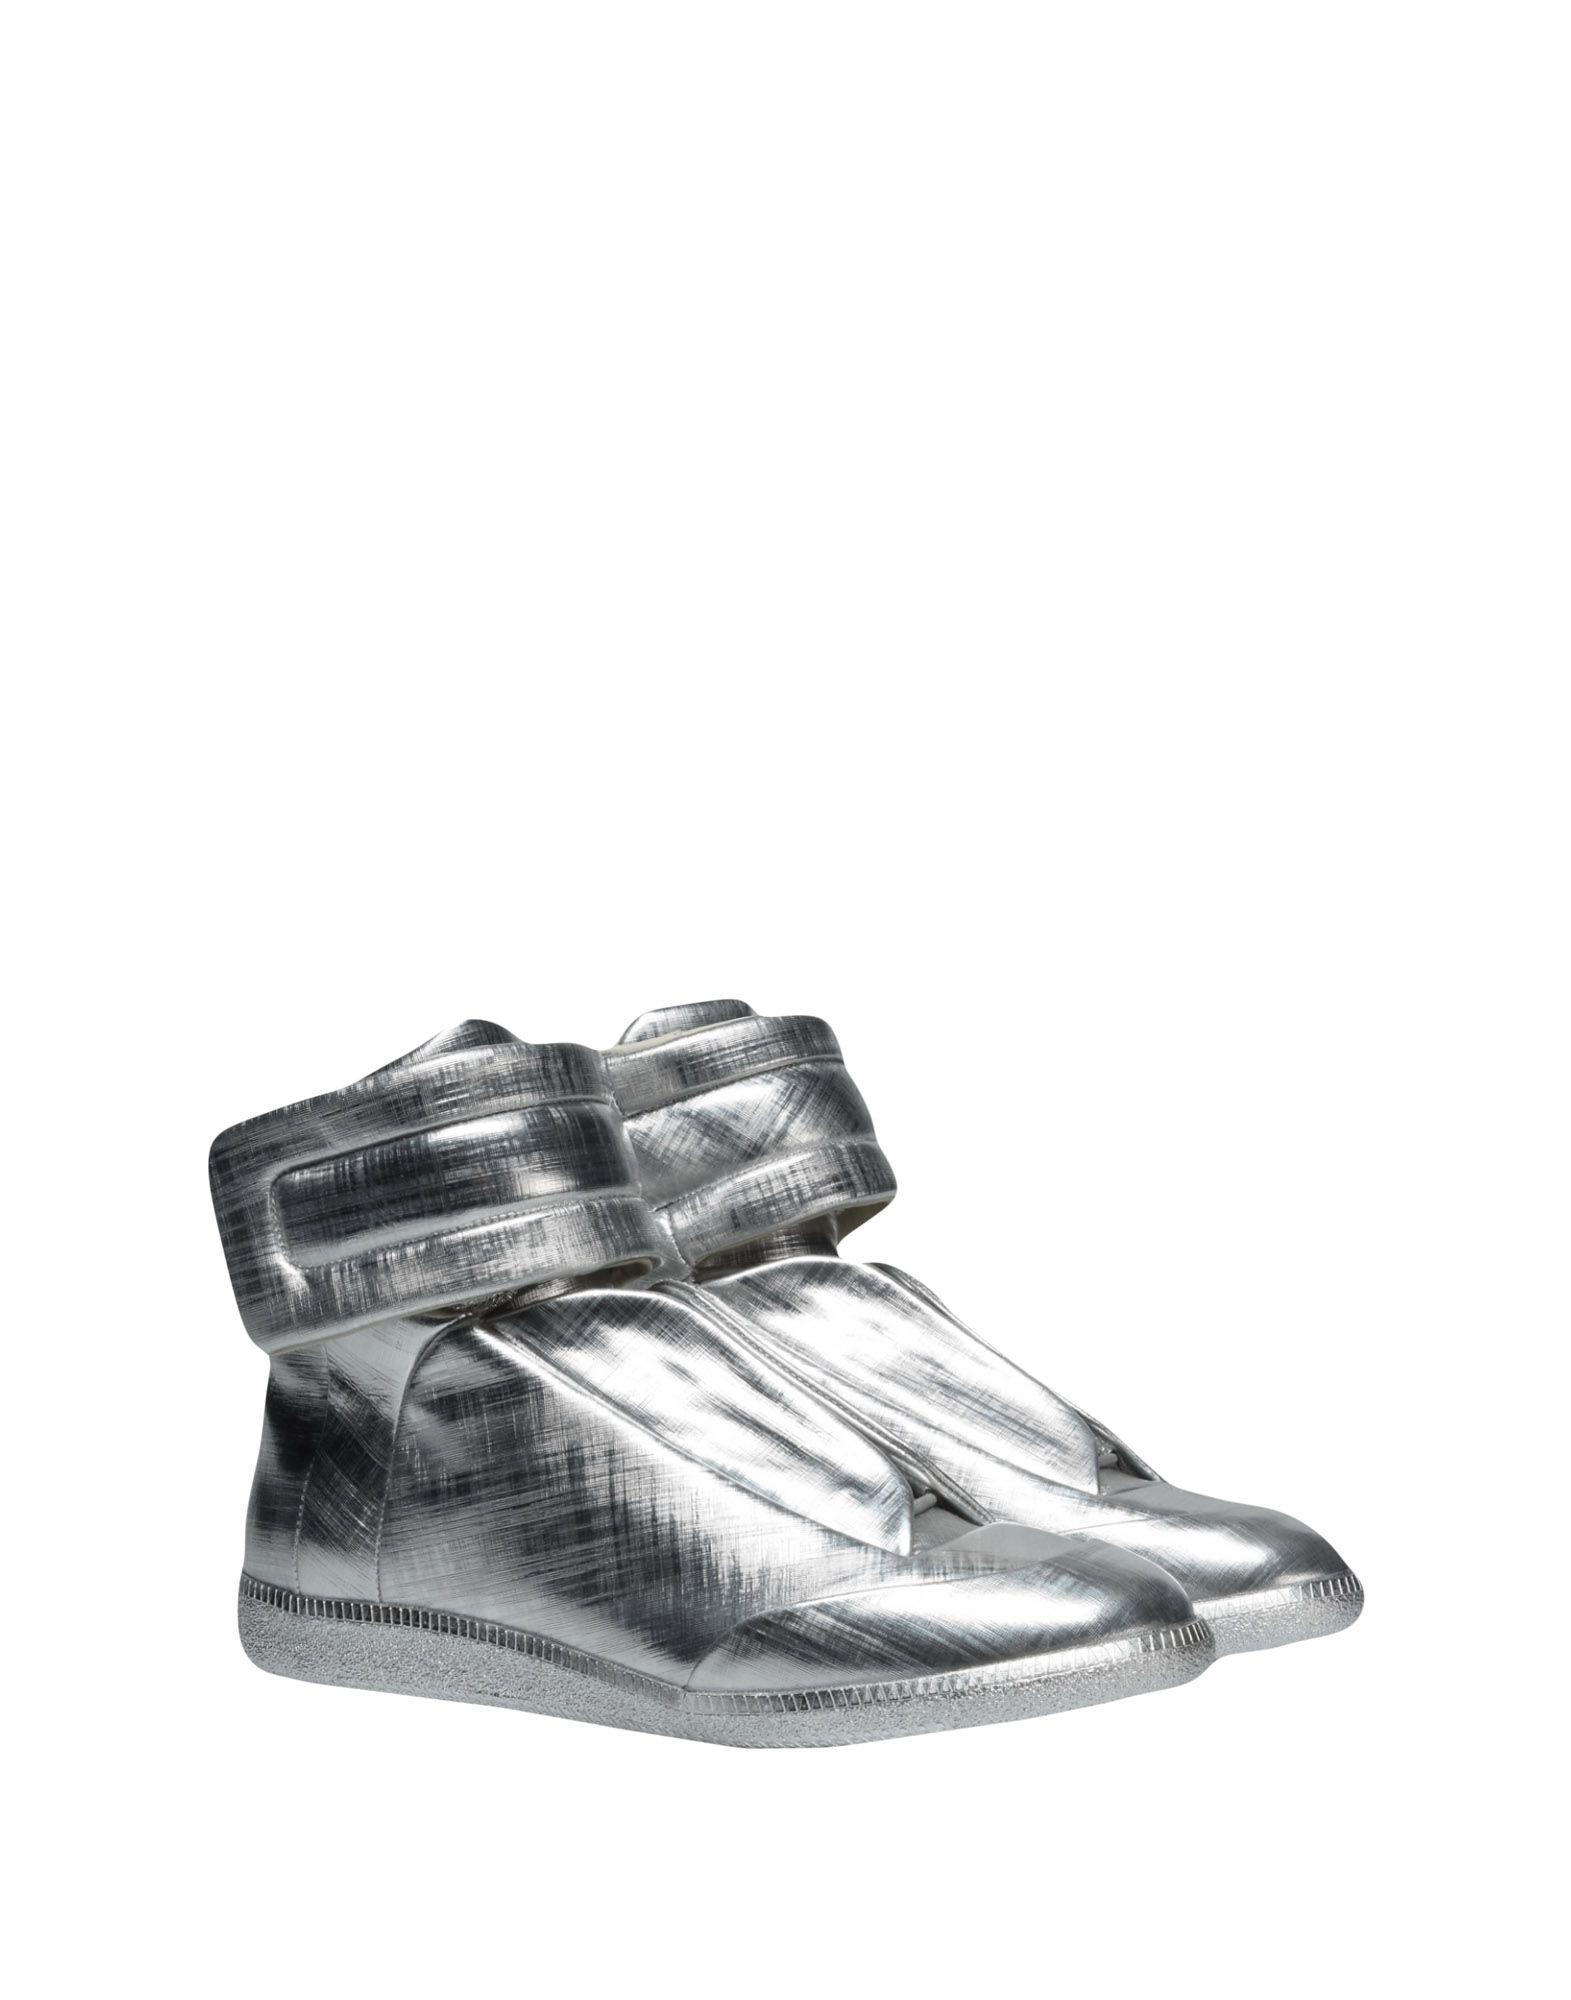 Maison Margiela Sneakers Herren  11315017AP Gute Qualität beliebte Schuhe